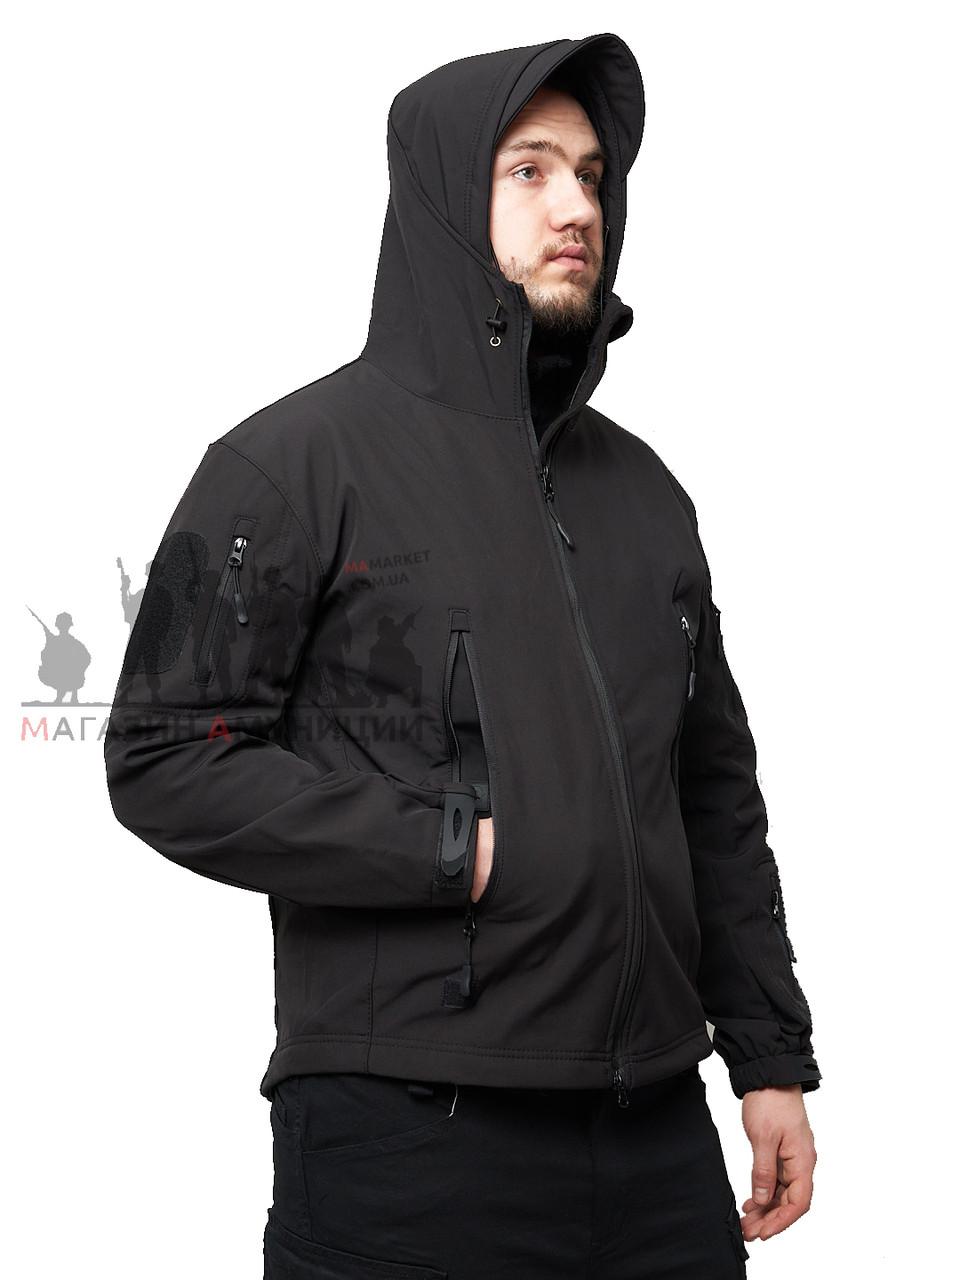 Куртка тактична Softshell Shark Skin 01. ESDY. Чорна 4XL